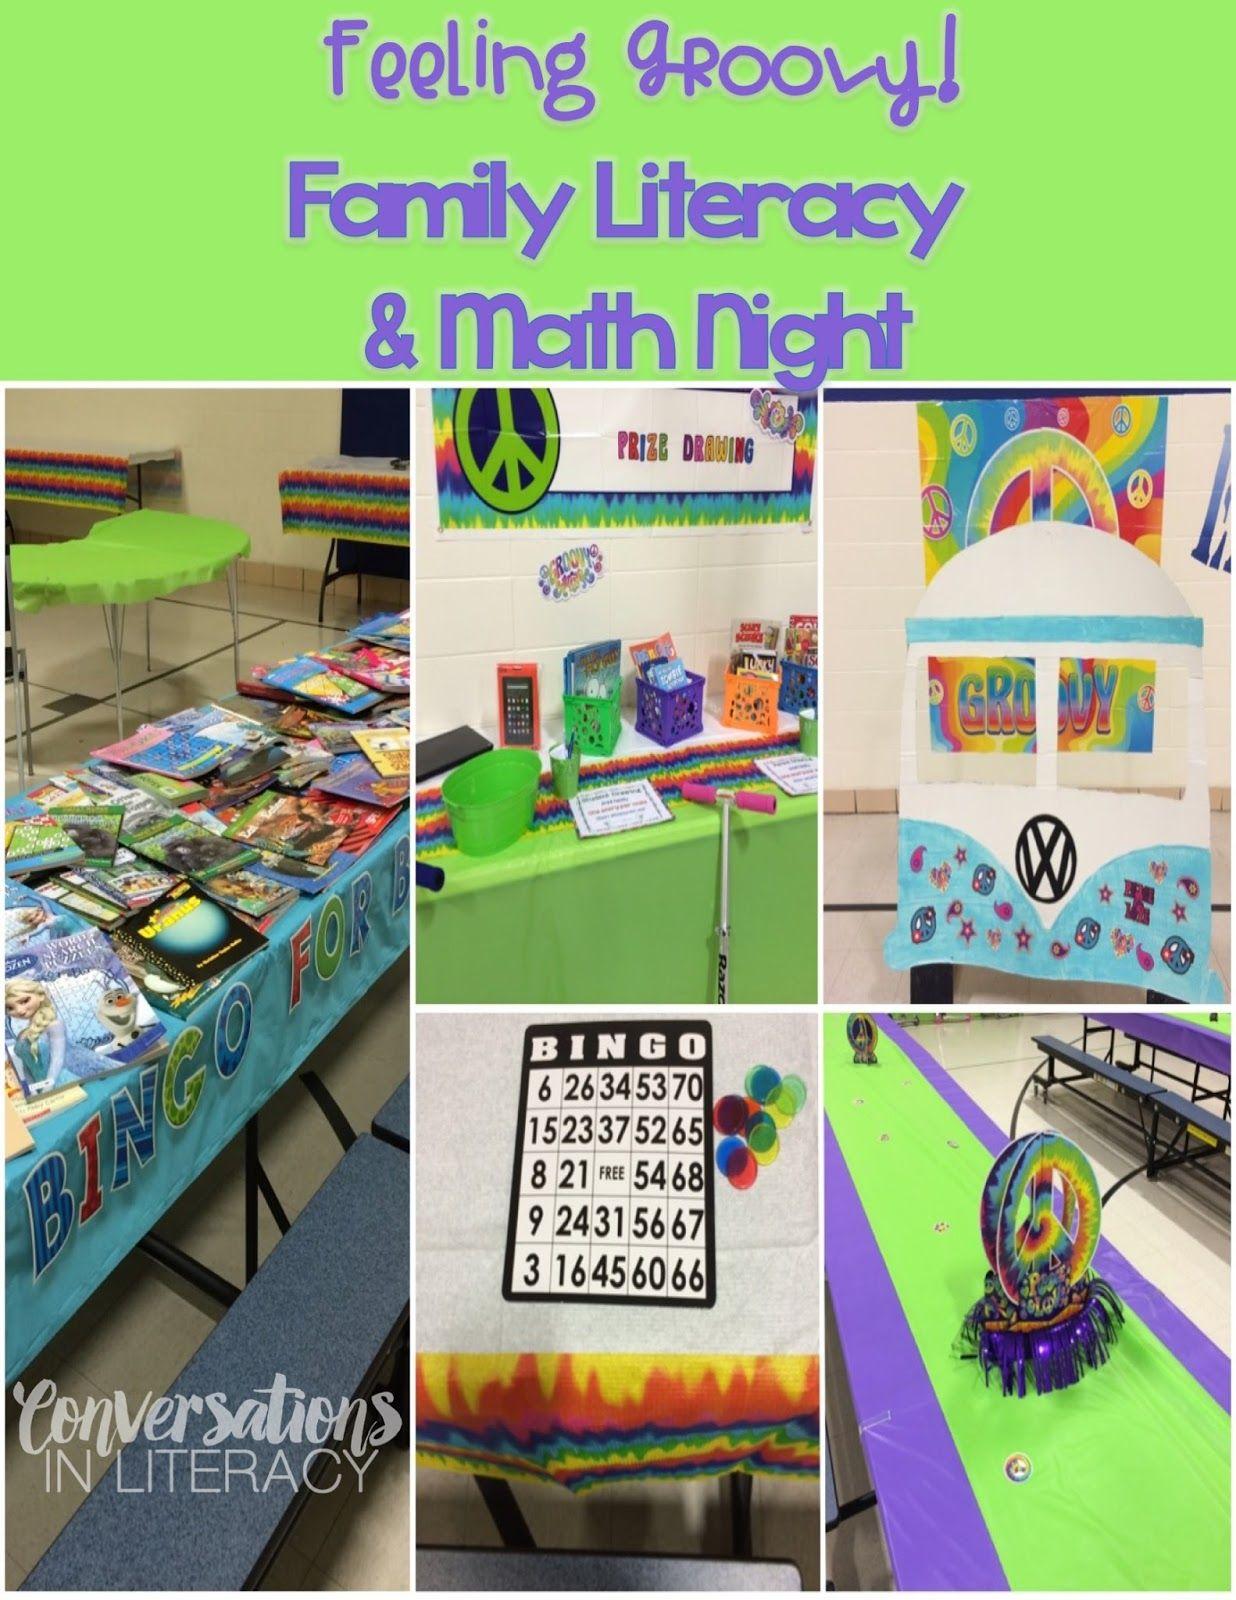 feeling groovy on family literacy night! | family nights | pinterest